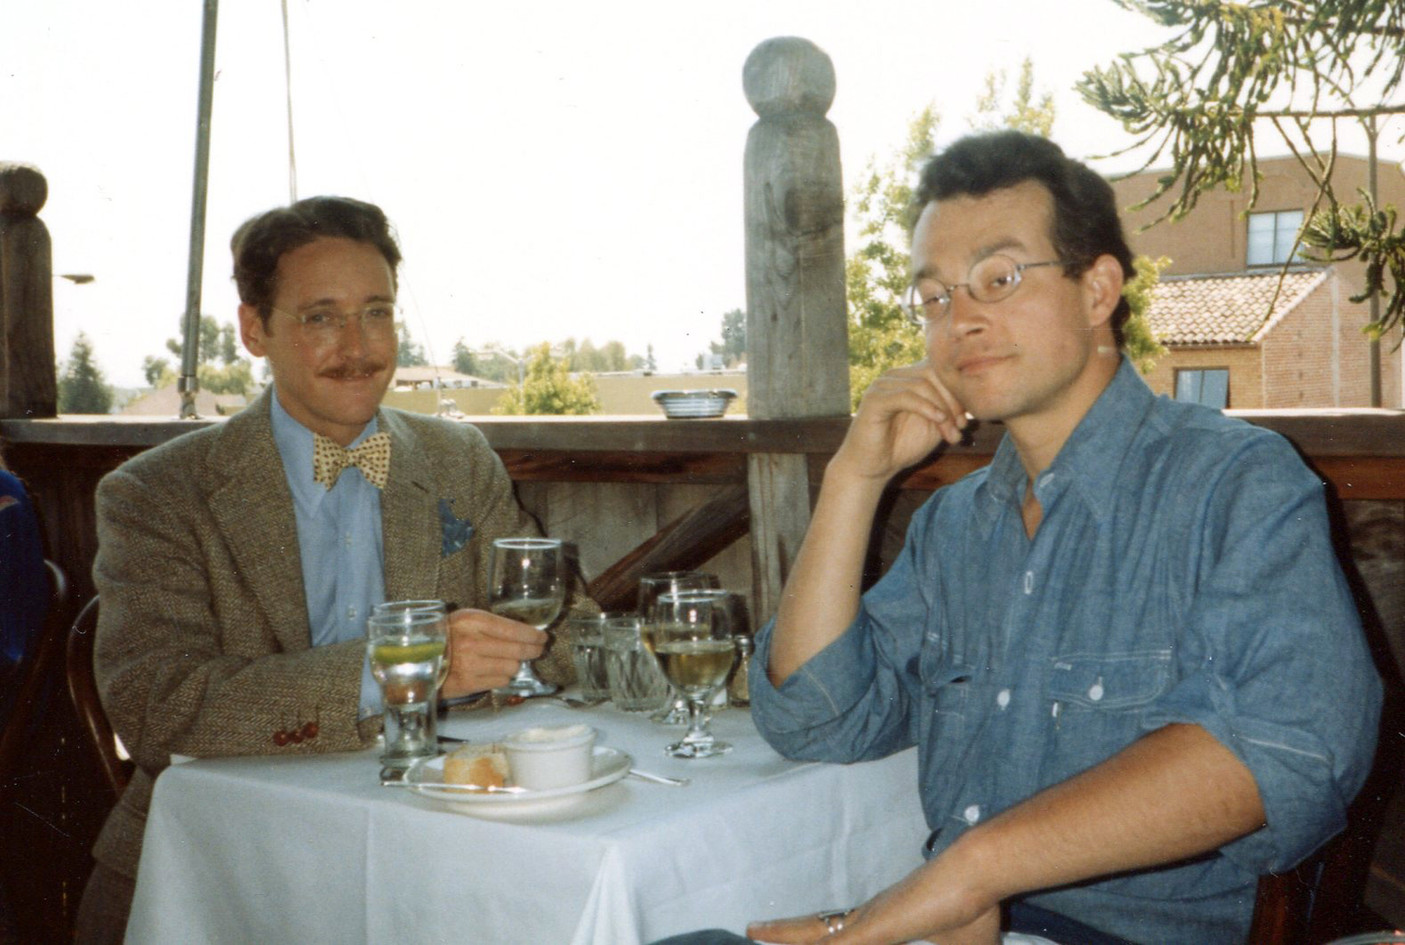 With David Lance Goines, Chez Panisse, 1981